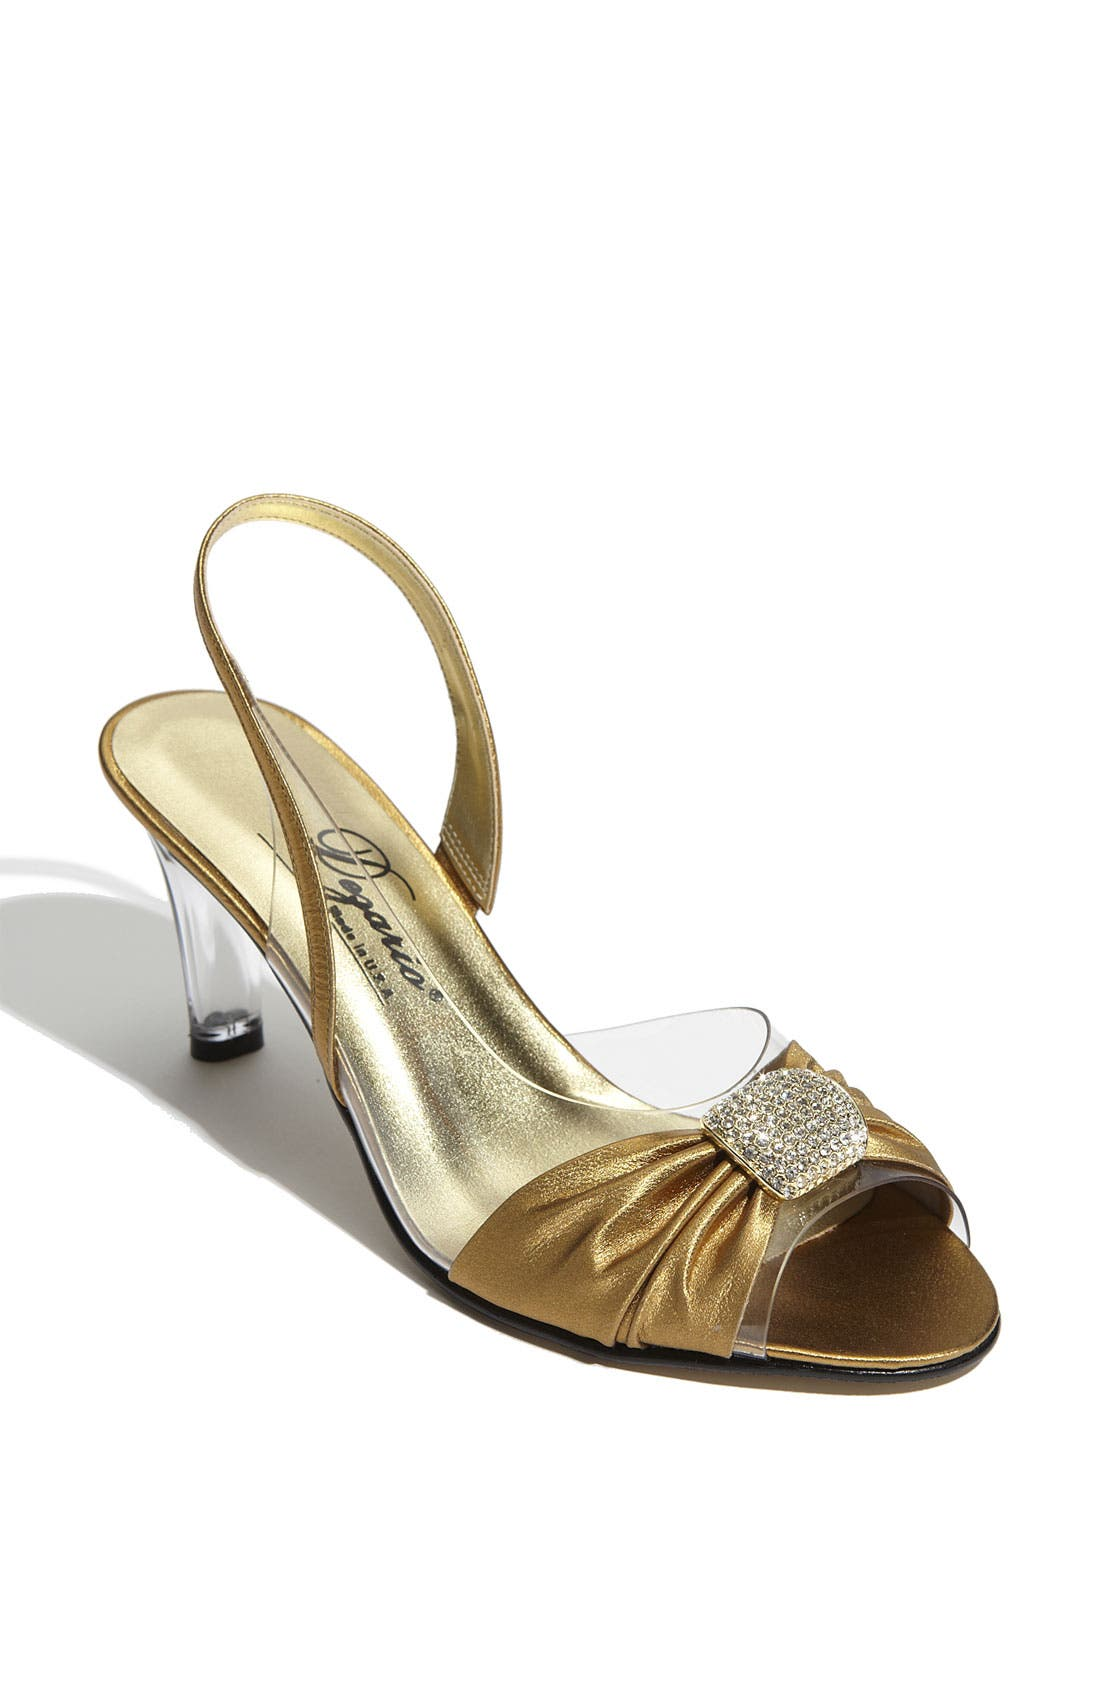 Alternate Image 1 Selected - Dezario 'Turban' Slingback Sandal